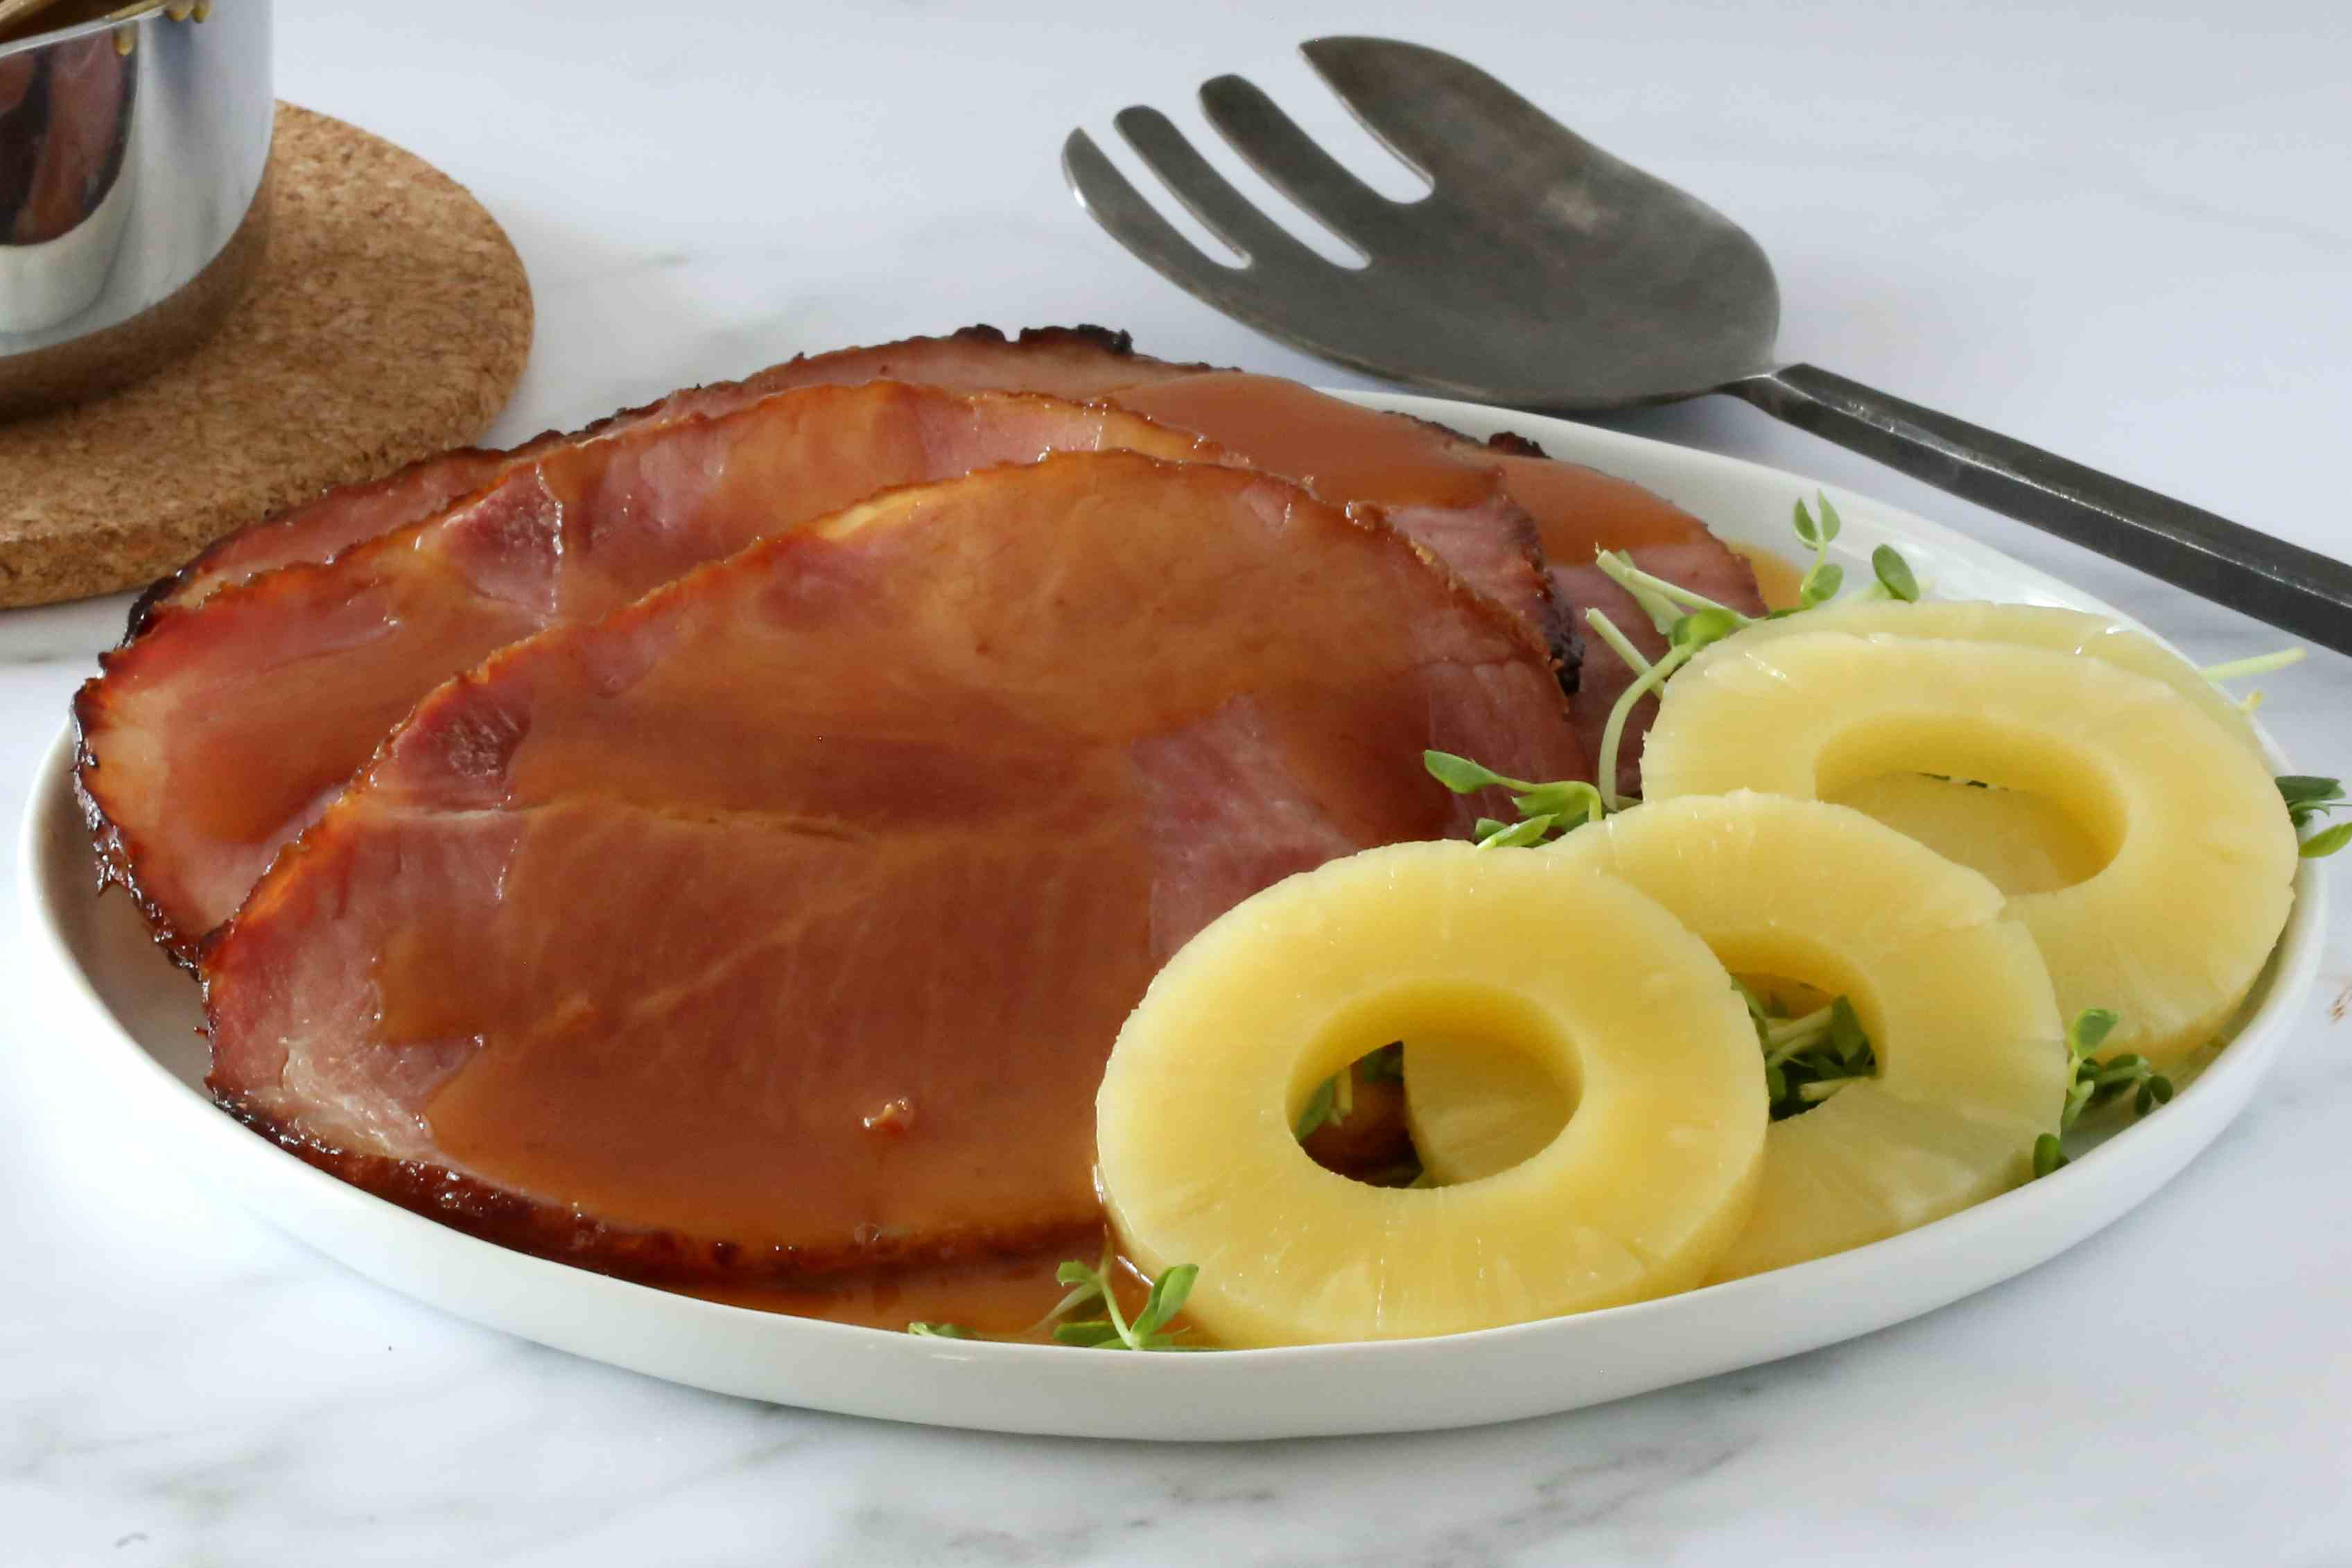 Ham with pineapple slices.